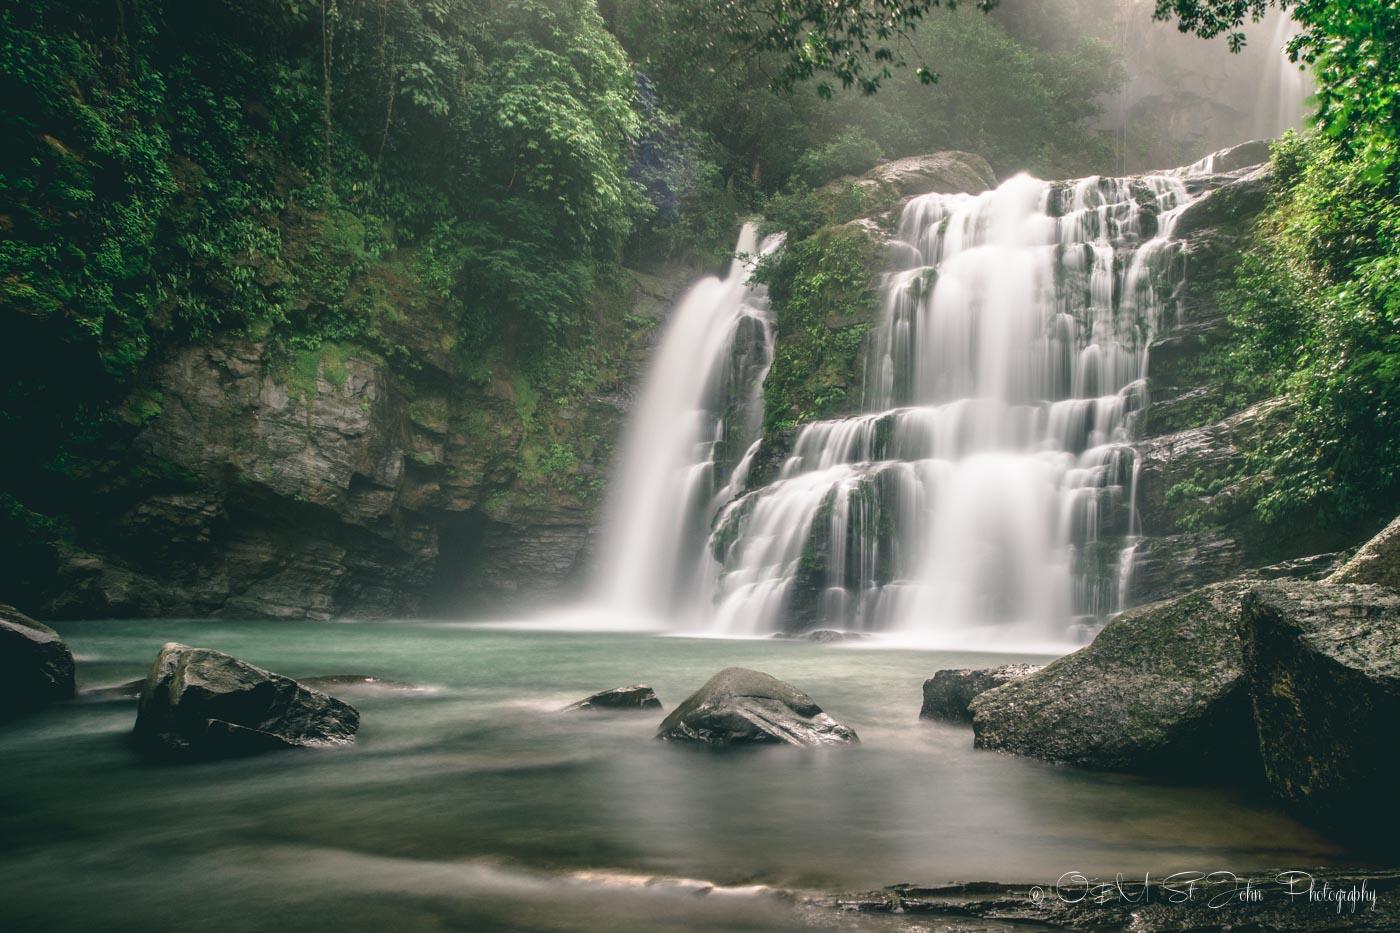 Nuayaca Waterfall, Dominical Costa Rica